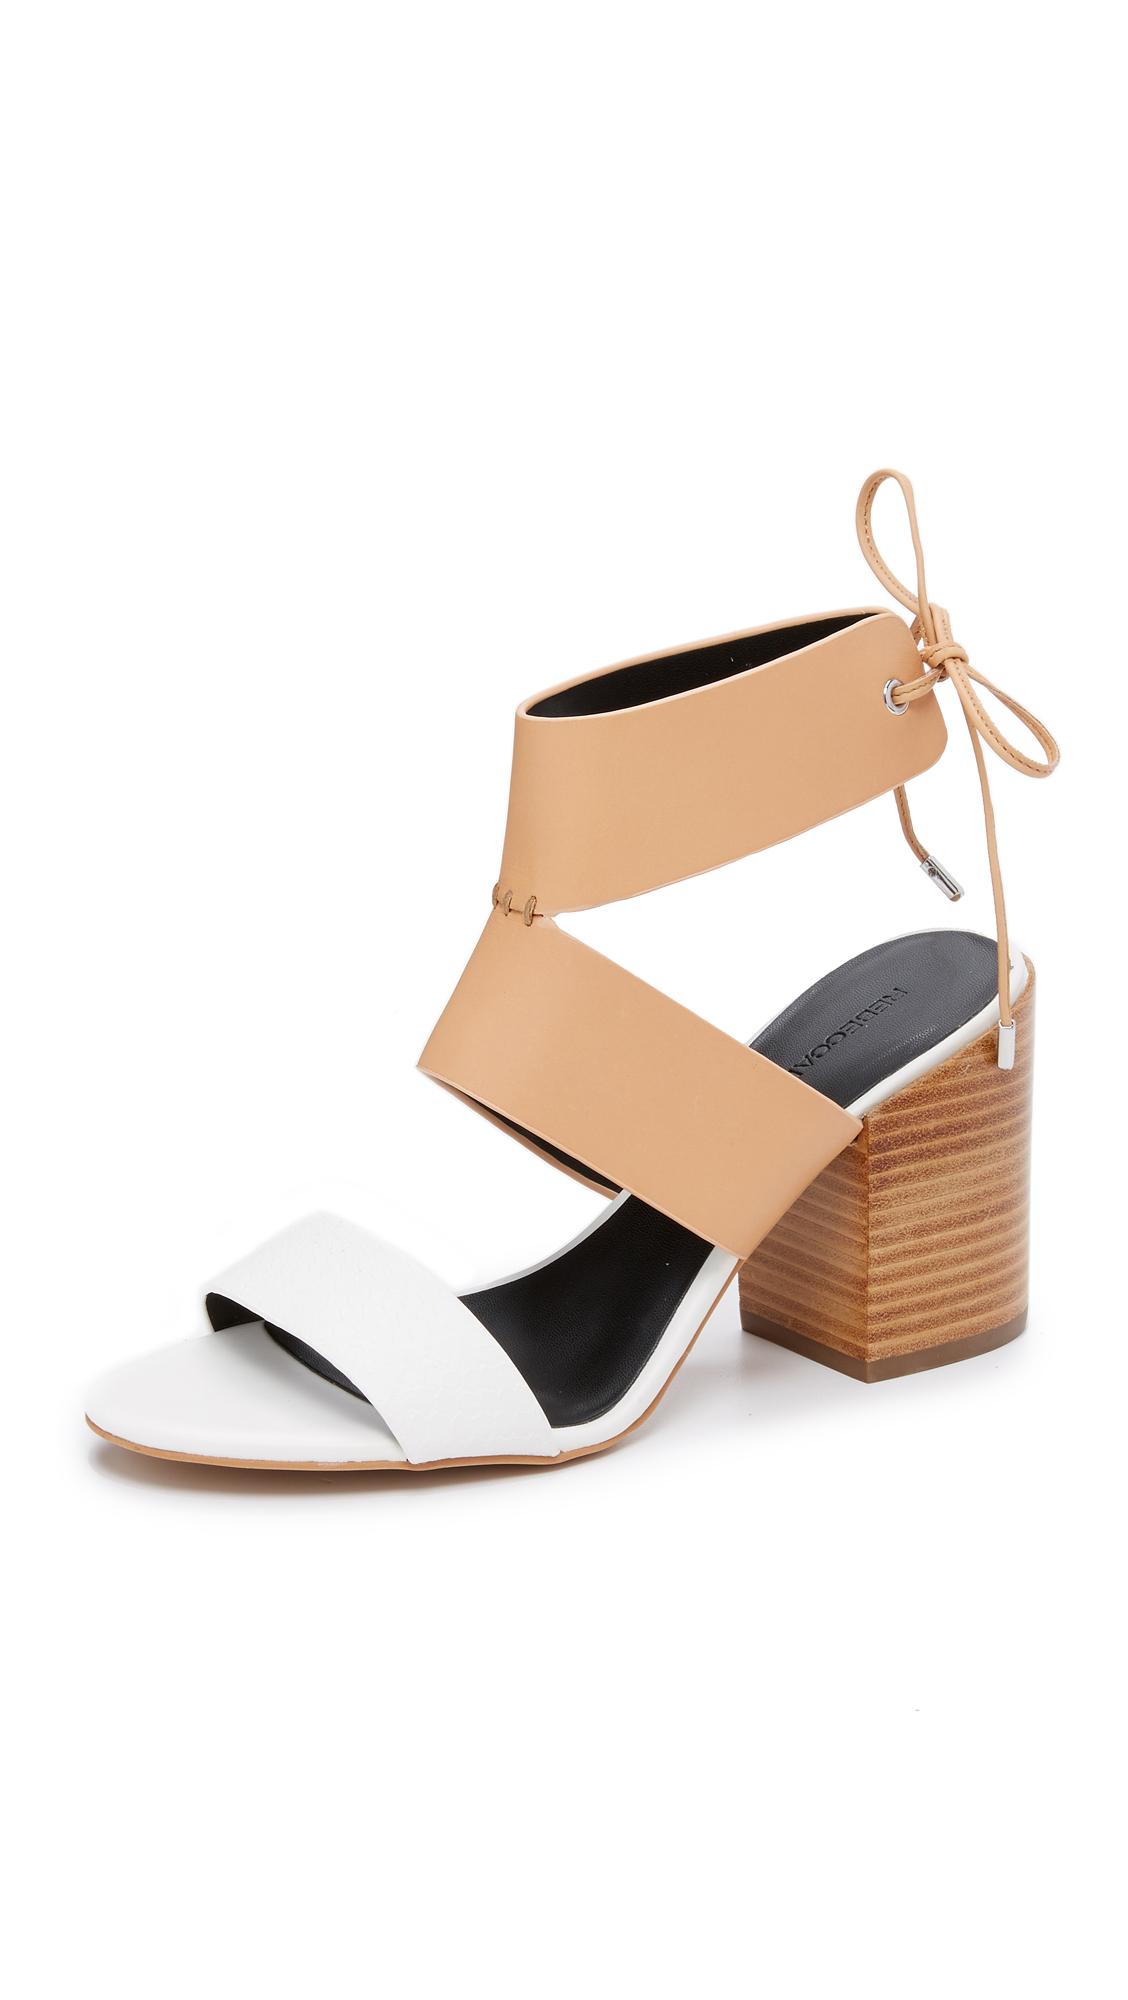 Sandale Entredoigt Blanc Rebecca jMLoe